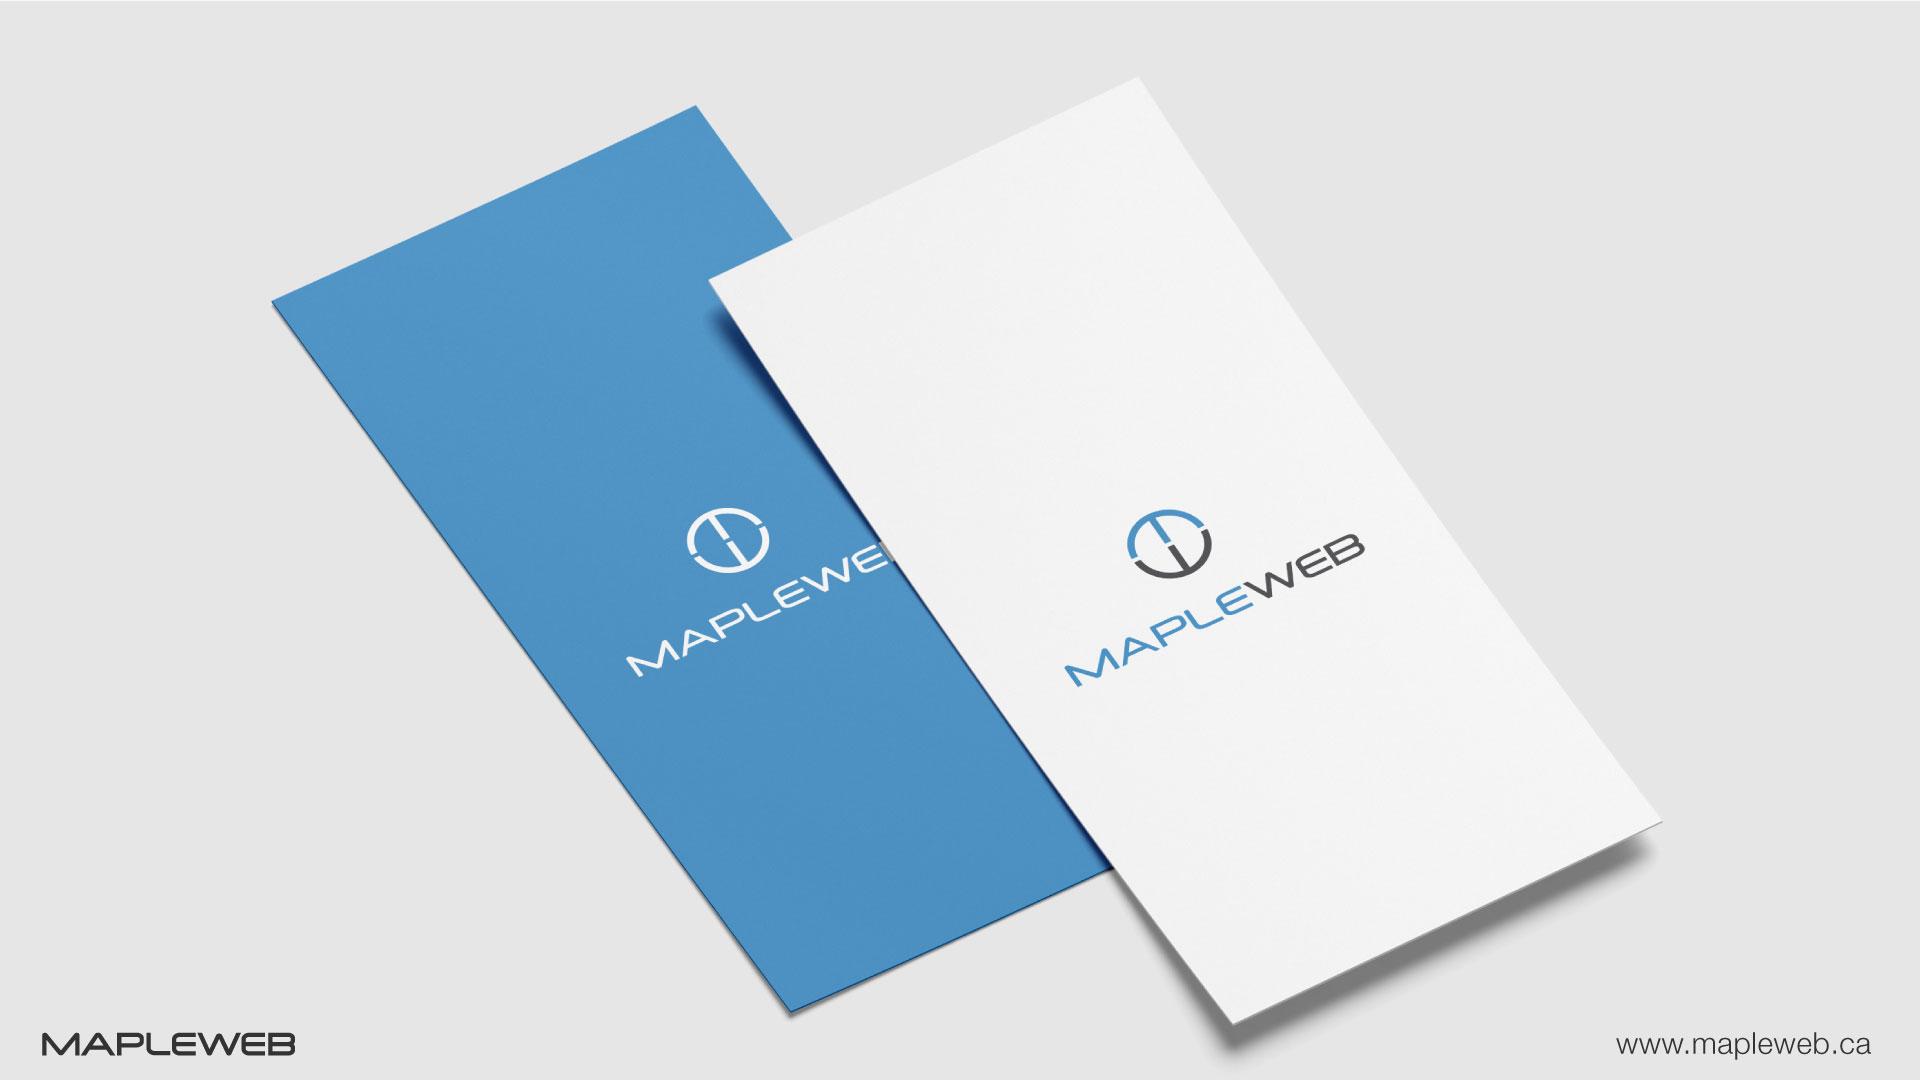 mapleweb-brand-logo-design-by-mapleweb-vancouver-canada-cards-mock